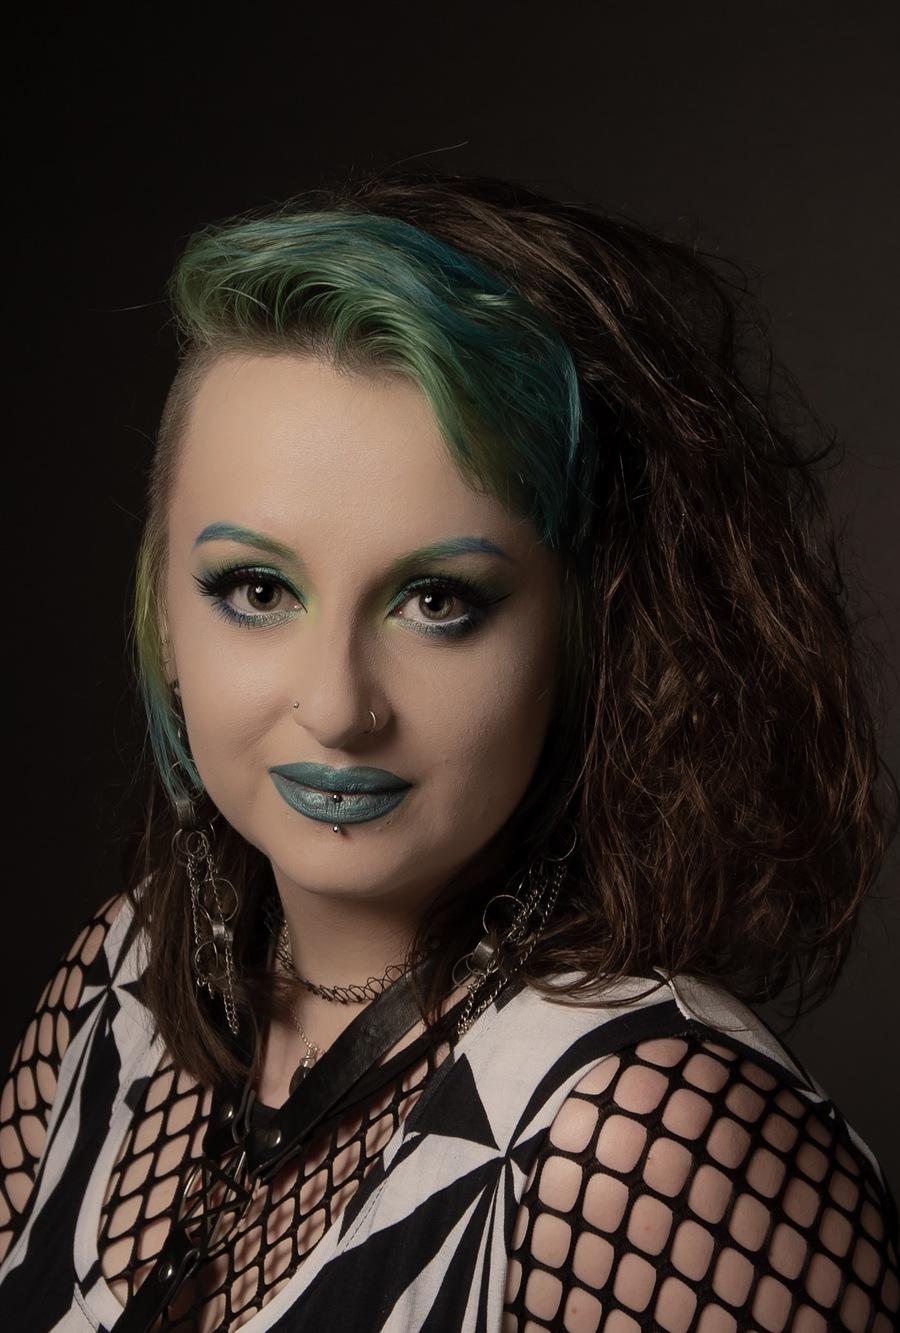 Tattylocks / Photography by D Aitch, Model TattyLocks / Uploaded 1st August 2019 @ 12:27 PM